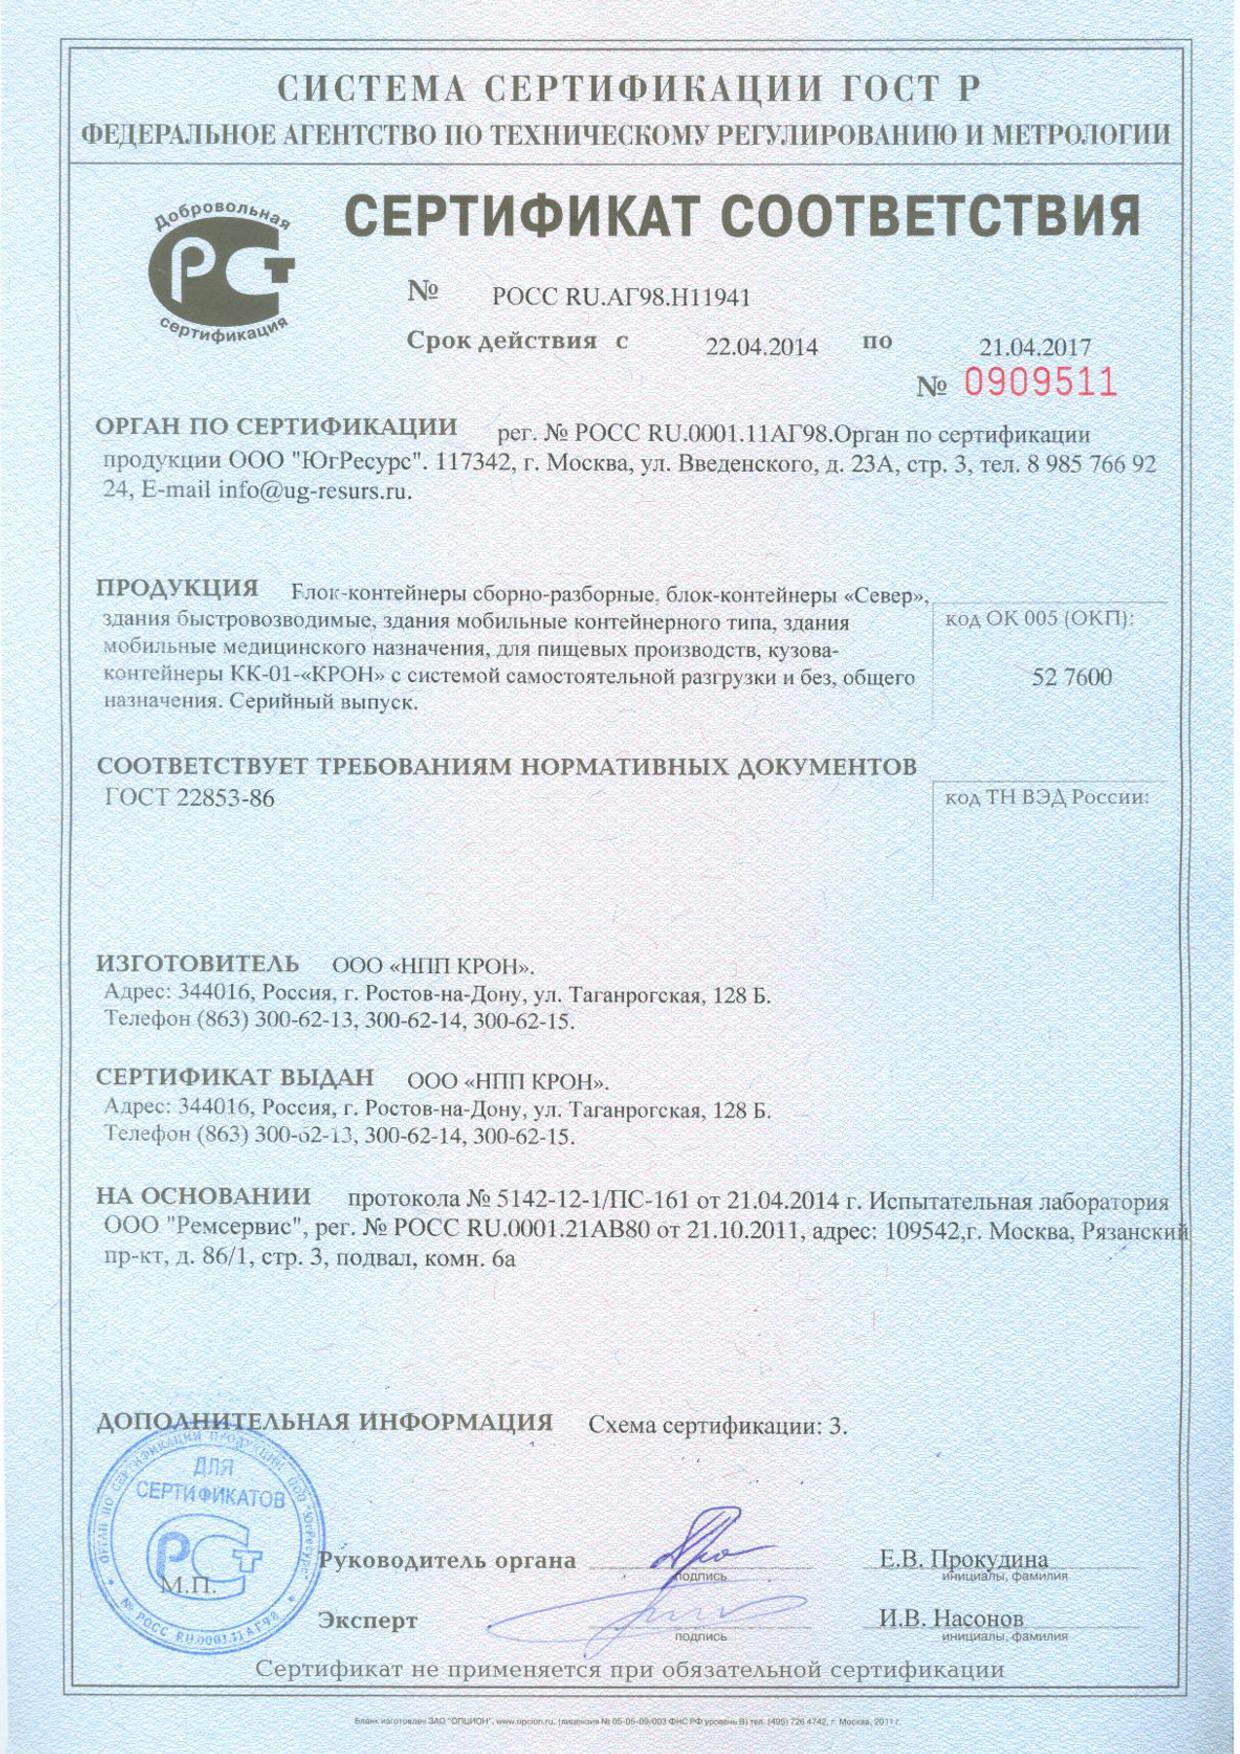 Сертификат на кузов-контейнер производства компании Kron Investment Group